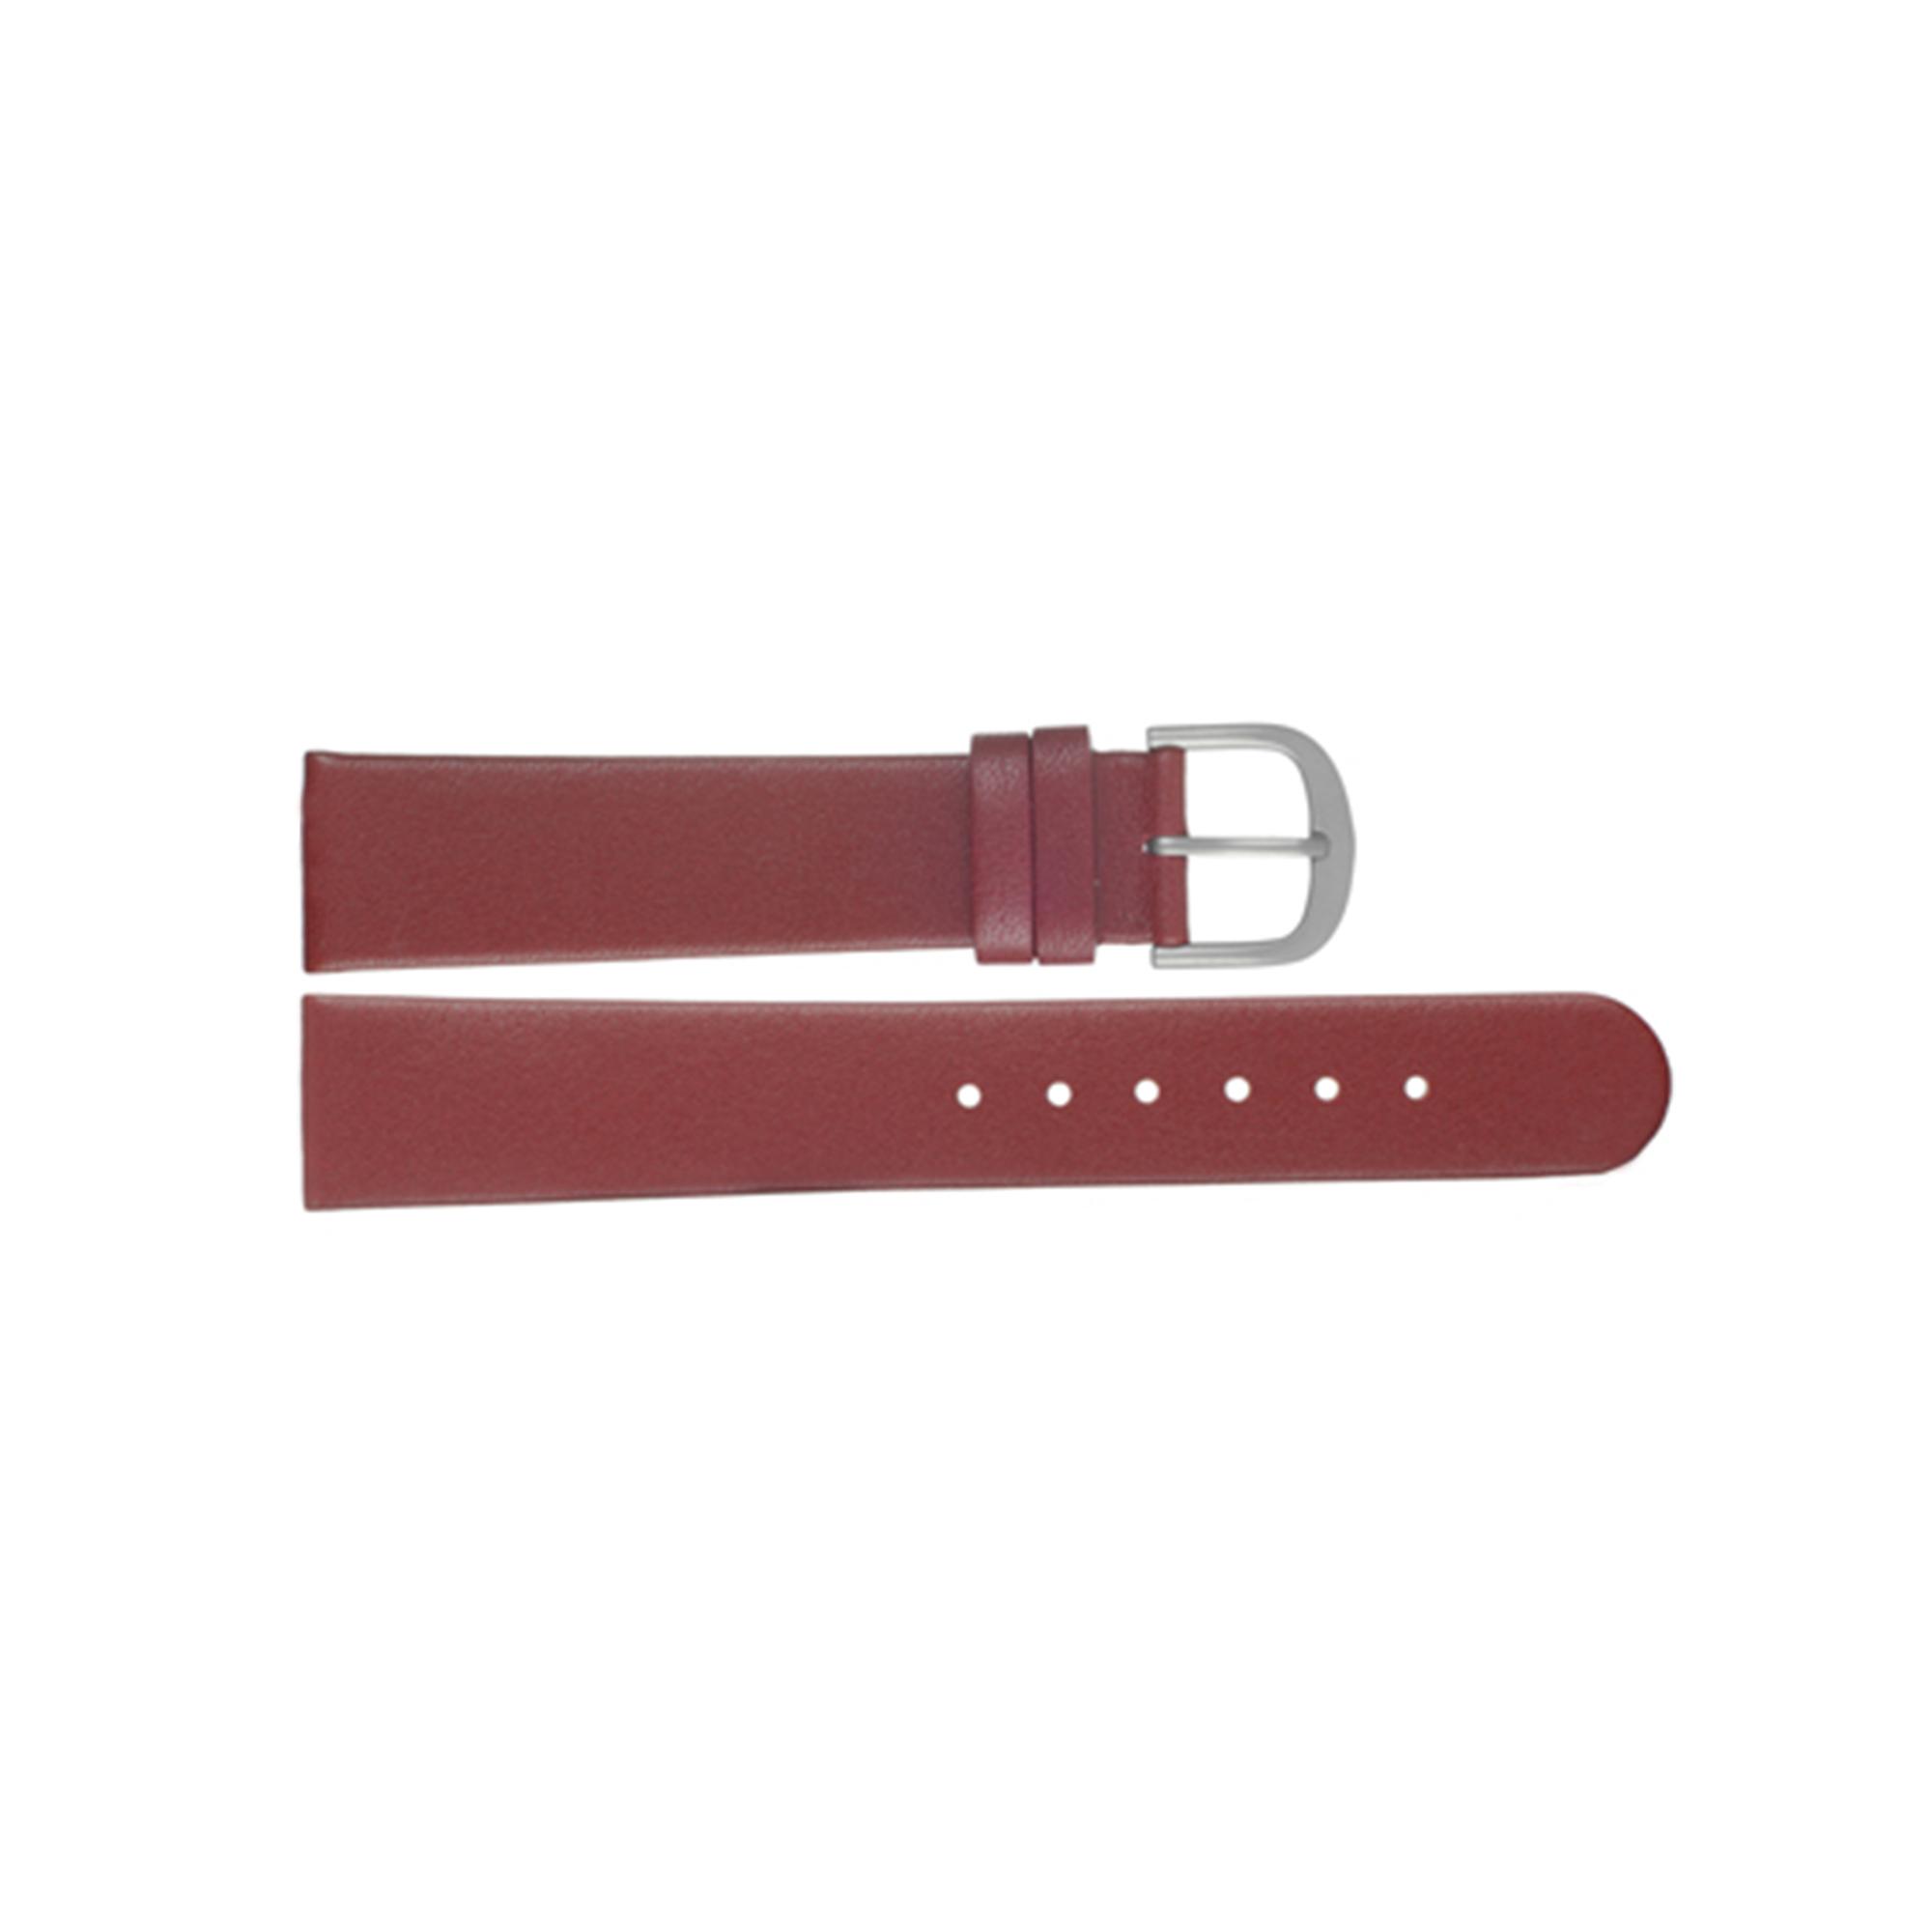 Danish Design horlogeband ADDRD18 Leder Rood 18mm